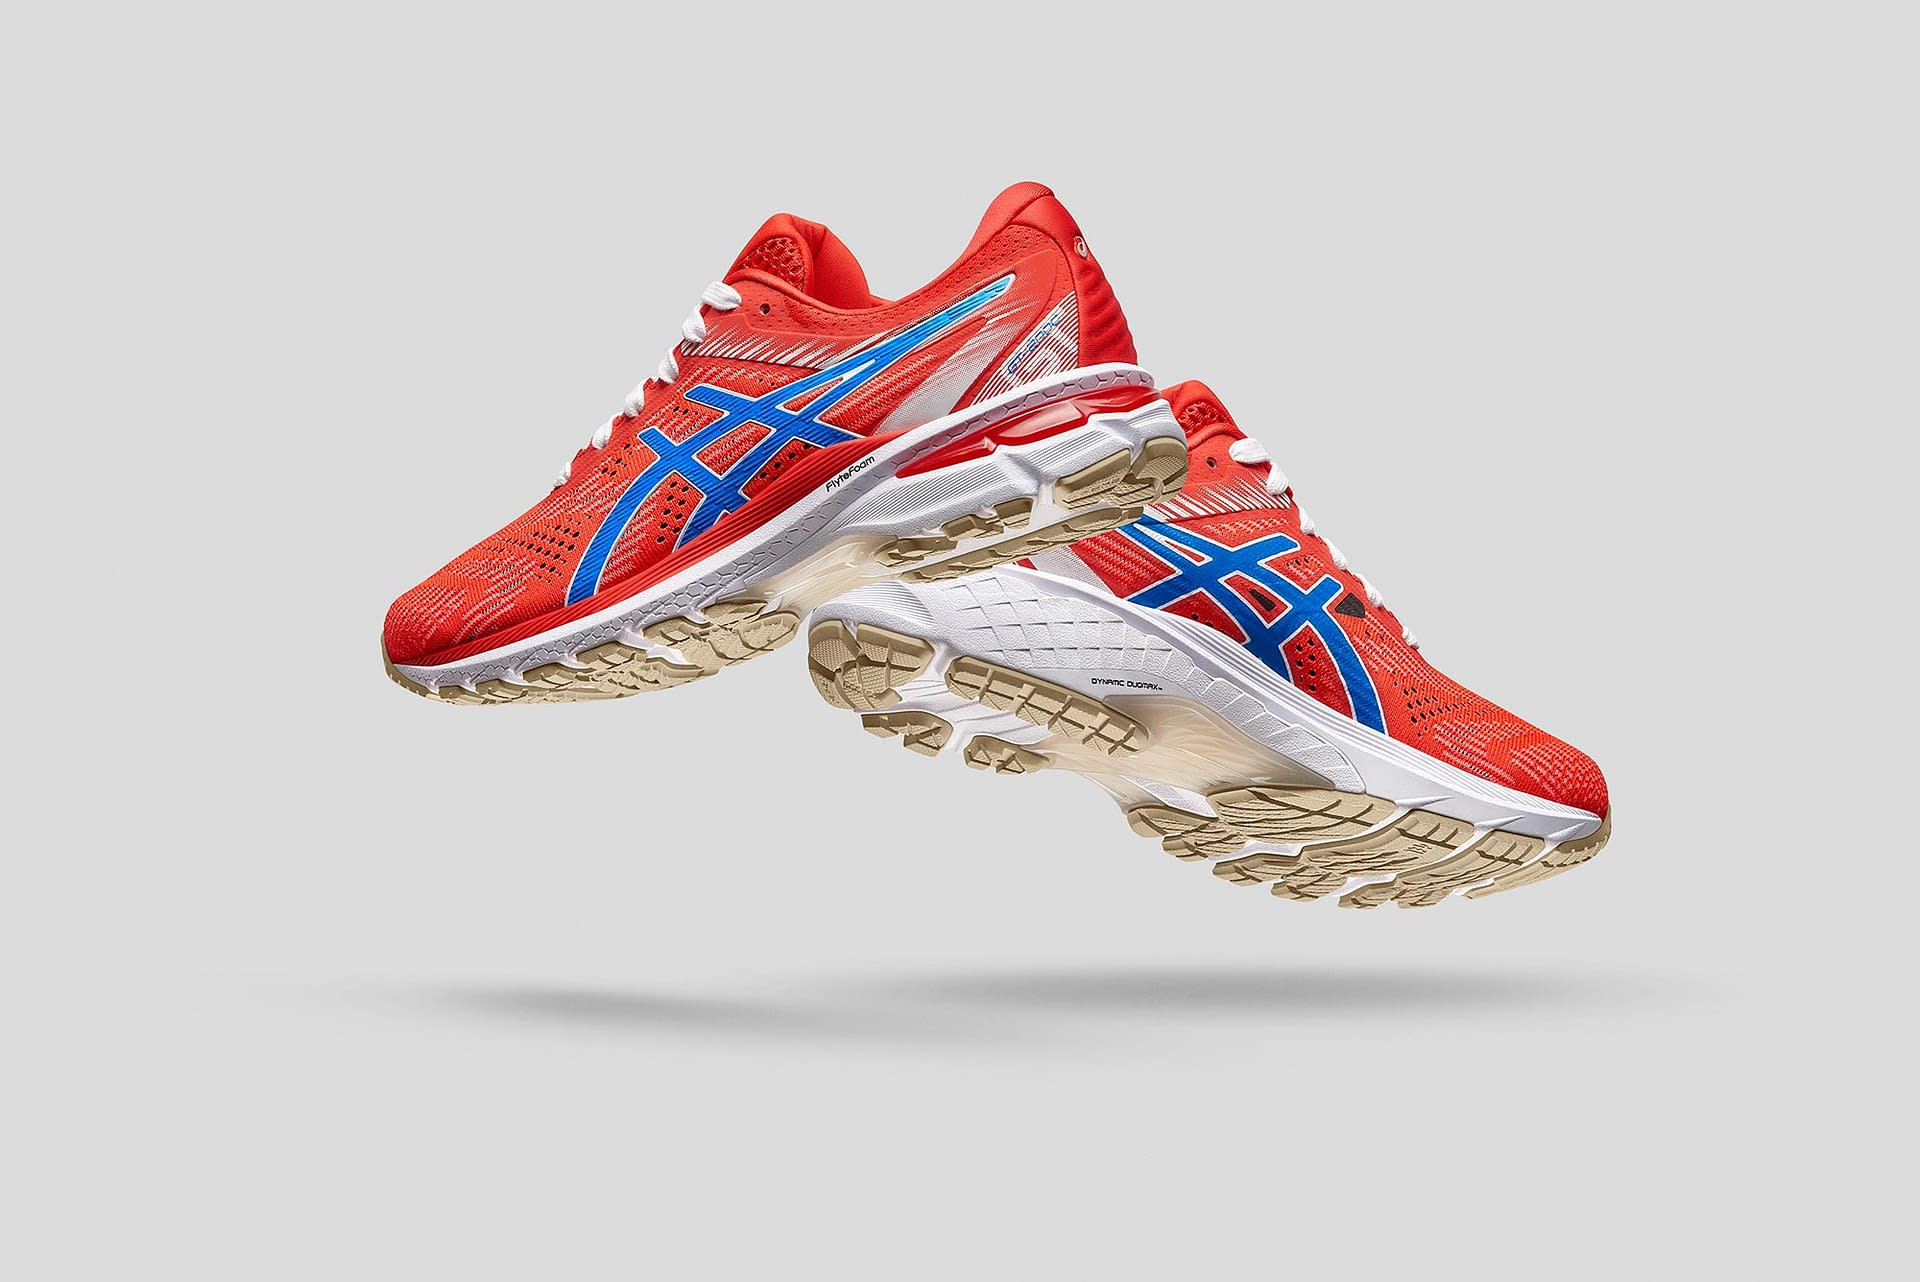 asics gel-kayano long distance running shoes shot in studio shooting tethered to a macbook pro laptop